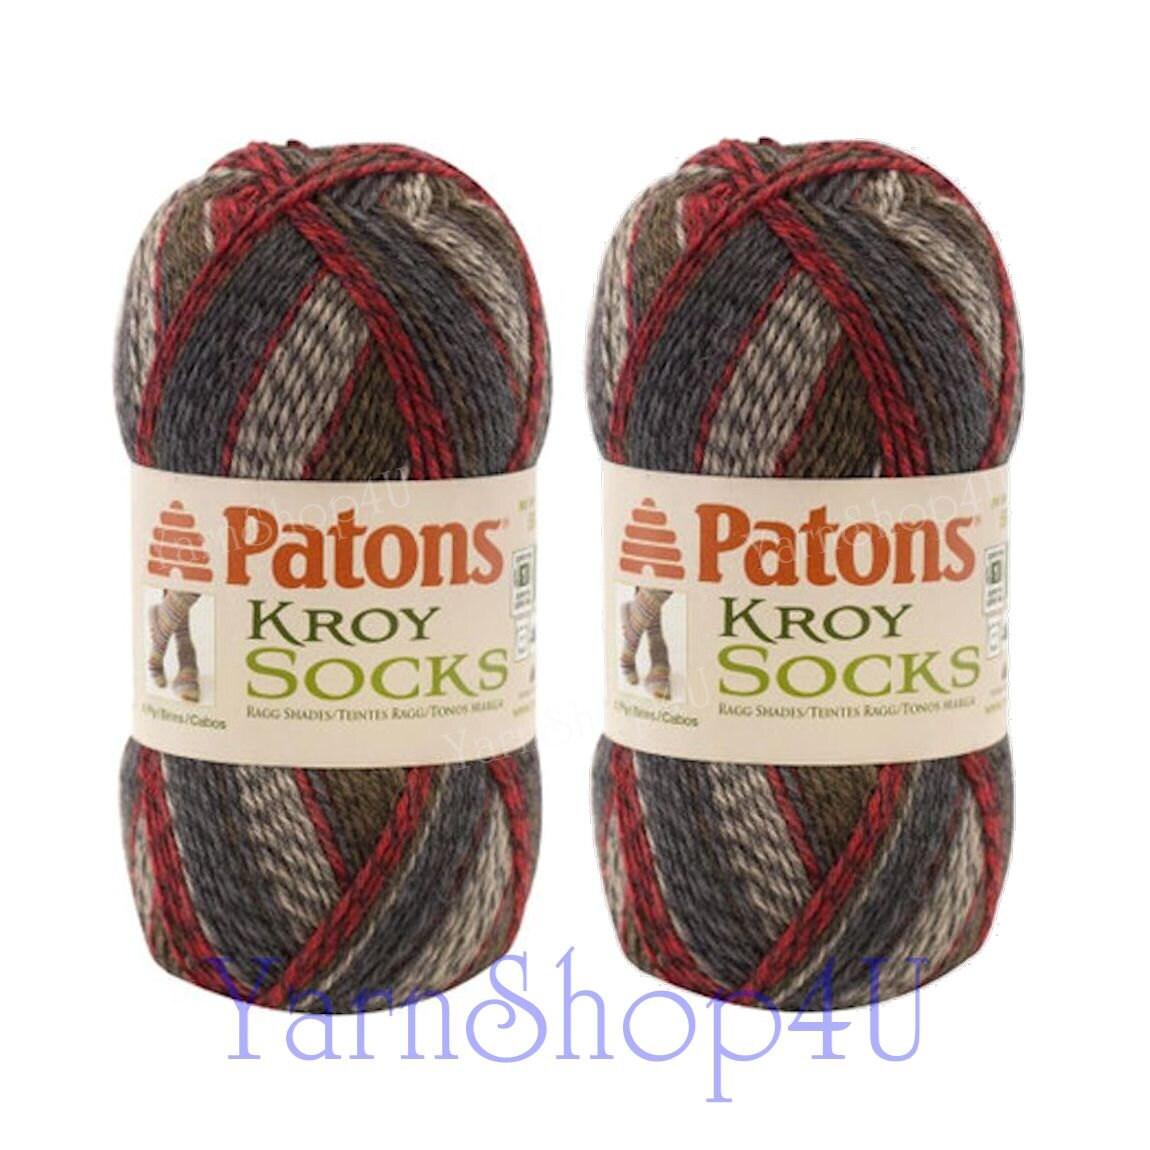 Single marl yarn